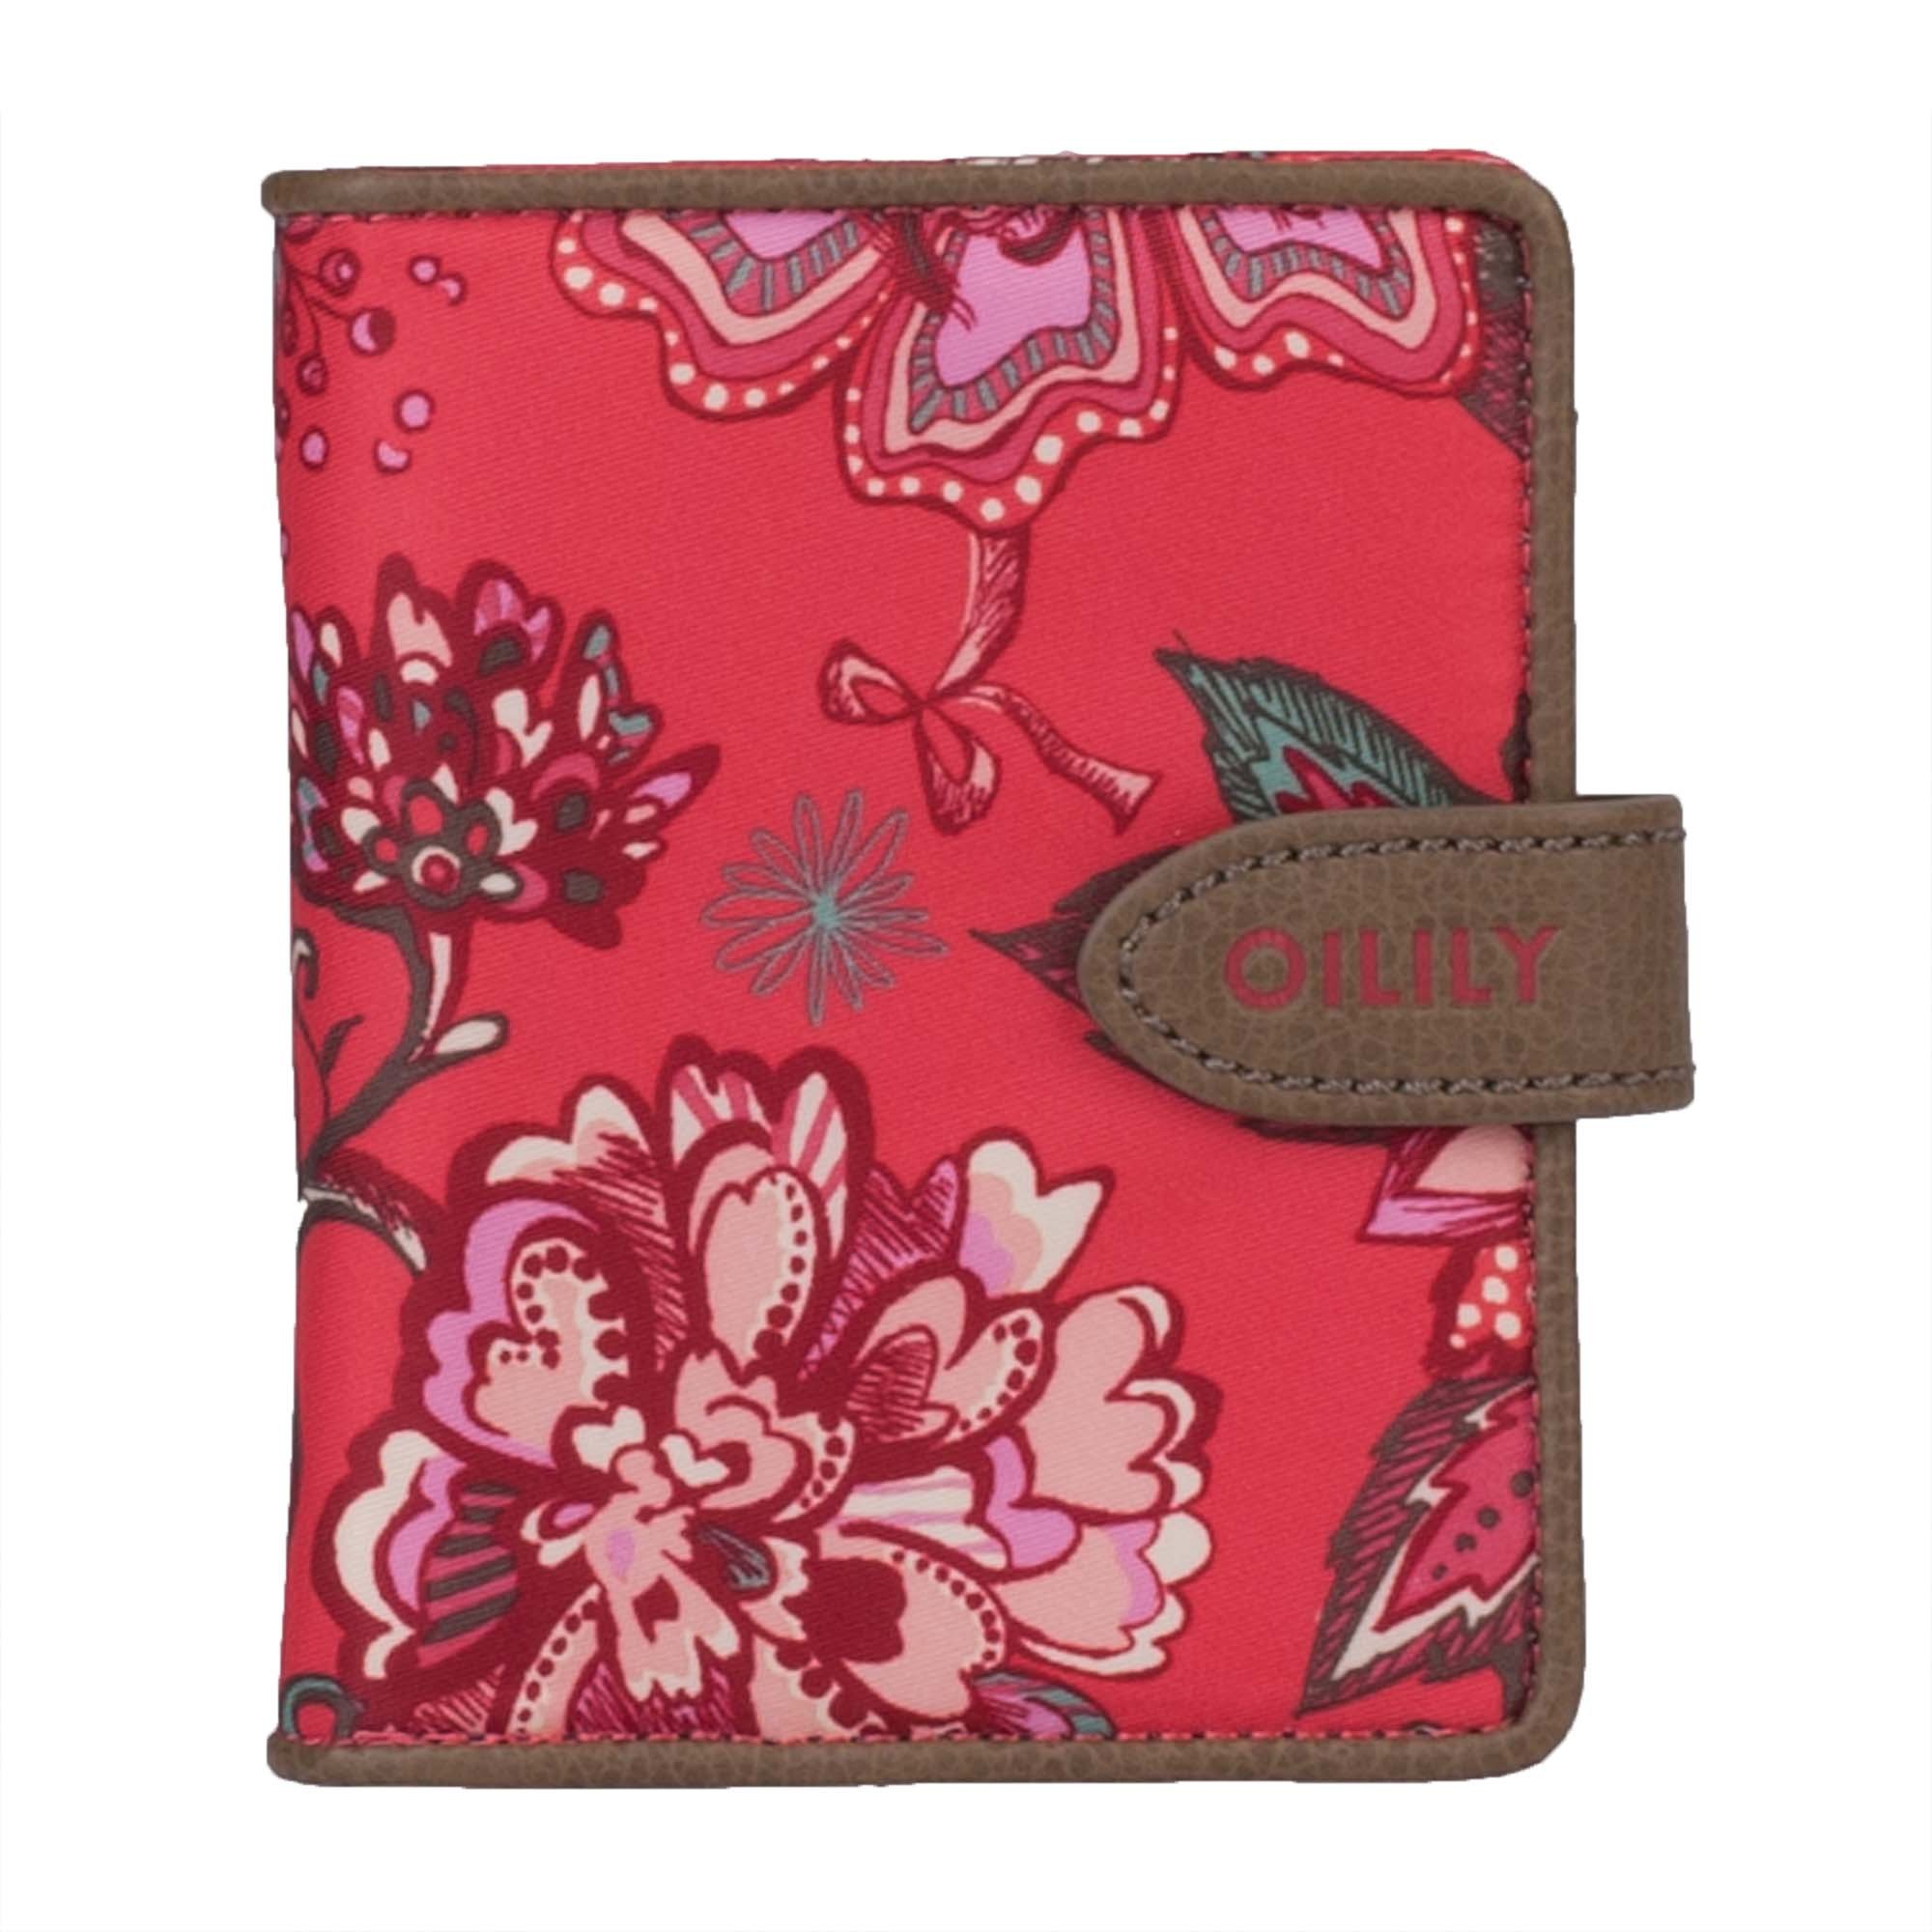 oilily geldb rse s flap wallet portemonnaie sea of flowers. Black Bedroom Furniture Sets. Home Design Ideas